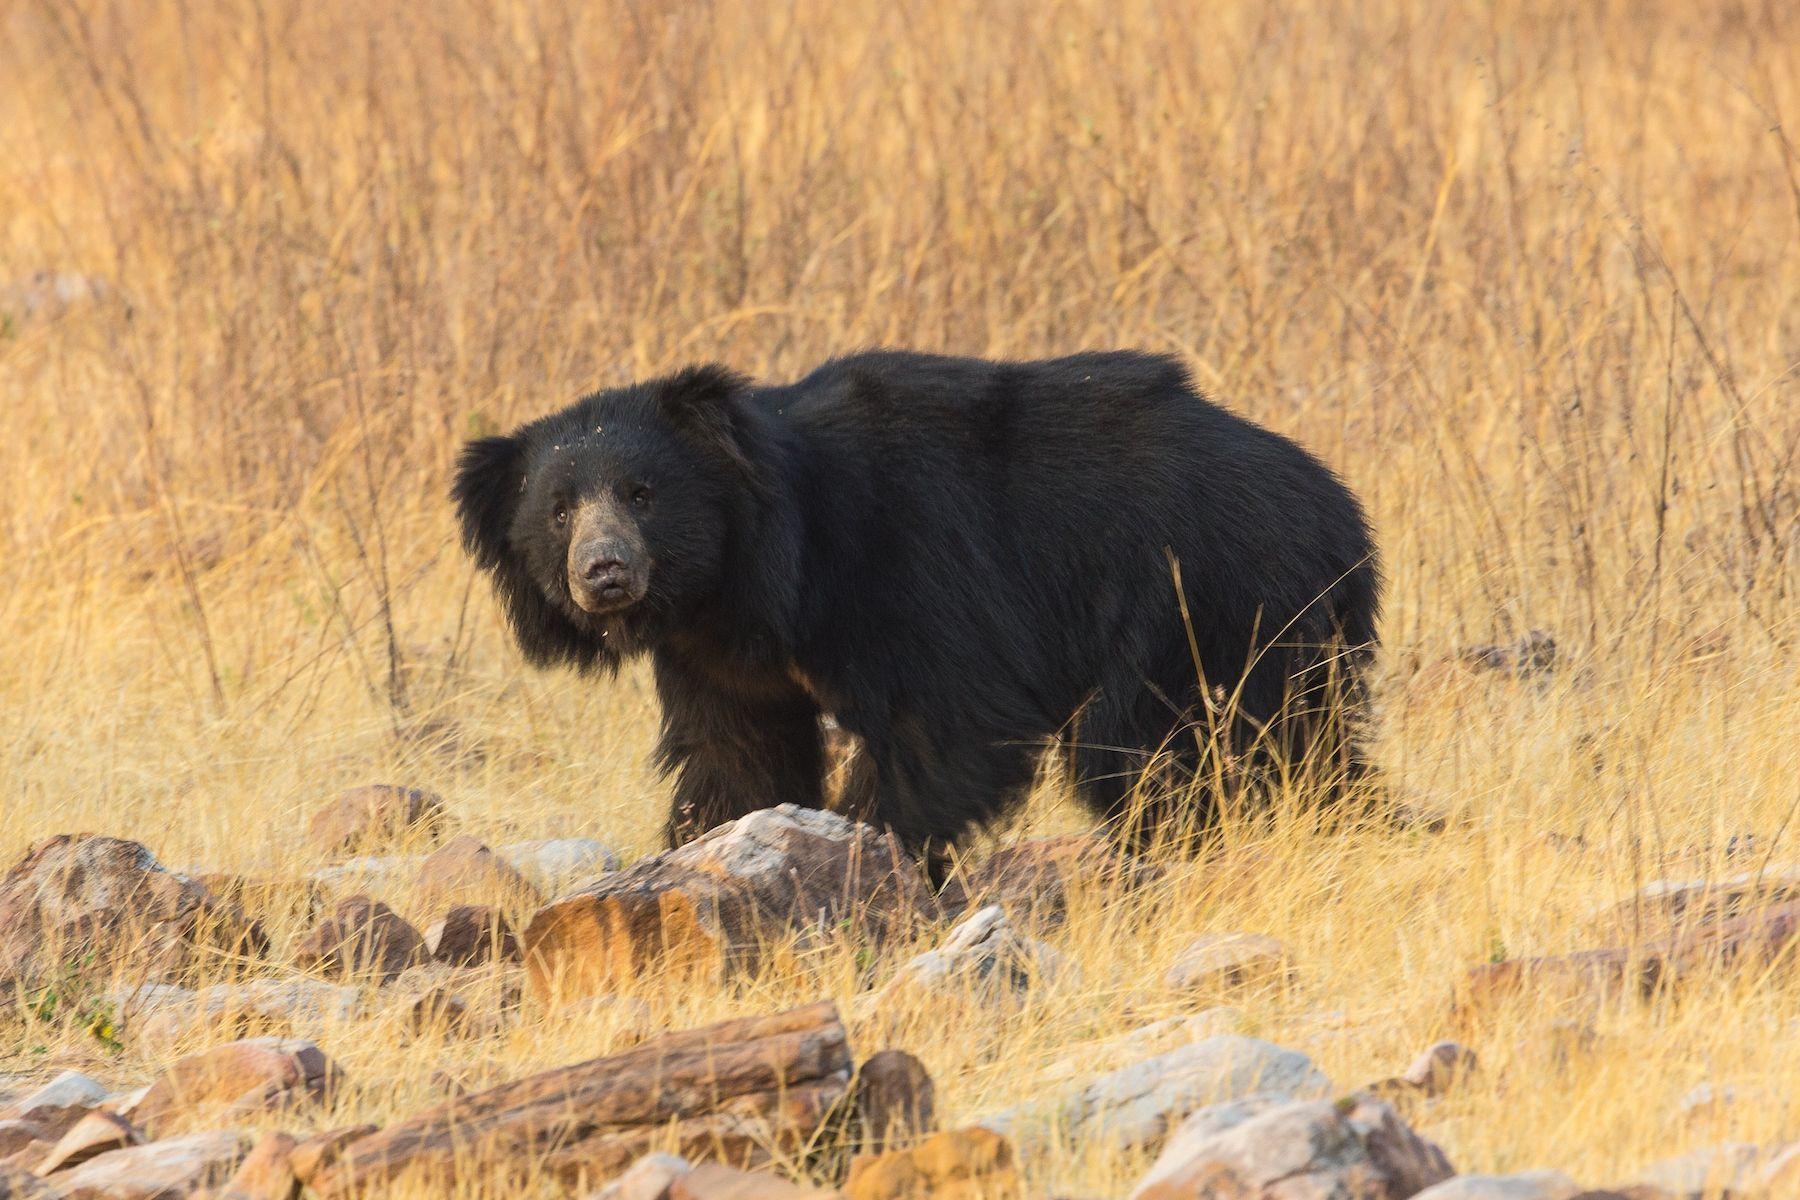 Sloth Bear: Photography tours by Inger Vandyke